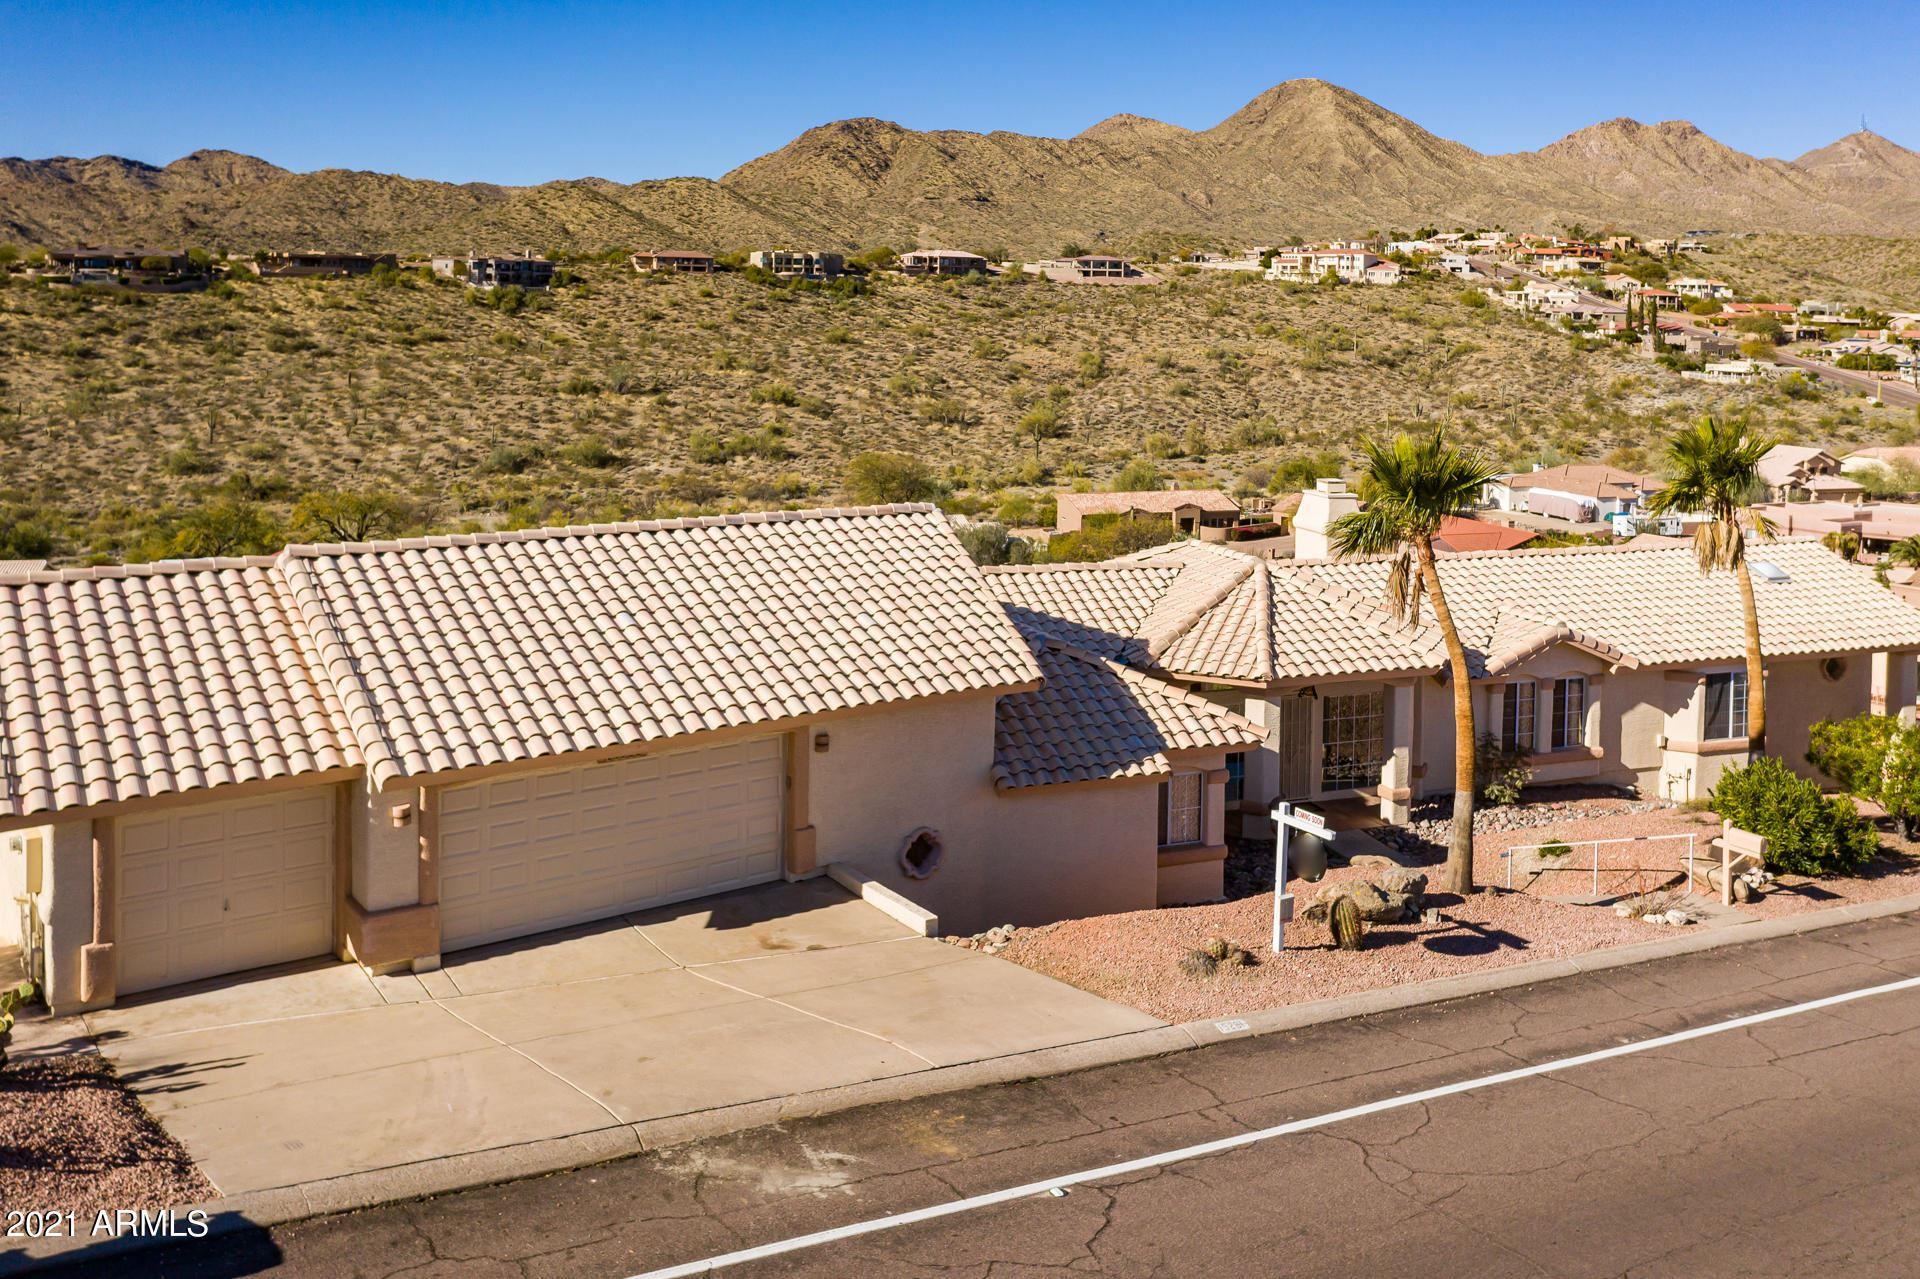 Photo of 15261 E GOLDEN EAGLE Boulevard, Fountain Hills, AZ 85268 (MLS # 6186332)